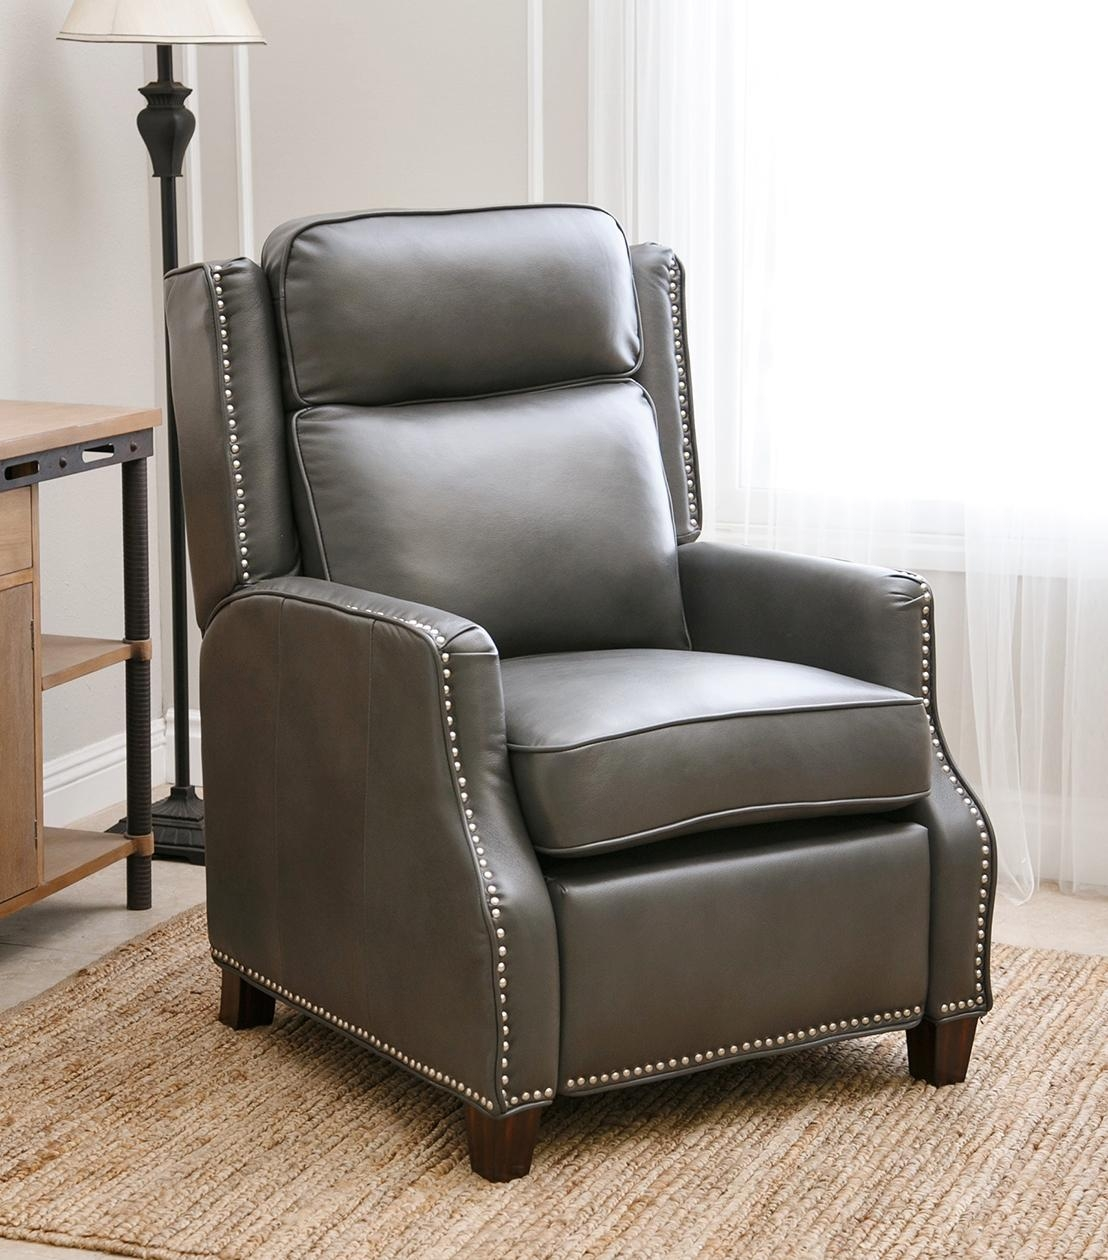 abbyson living rocking chair bent wood 20 best recliners sofa ideas